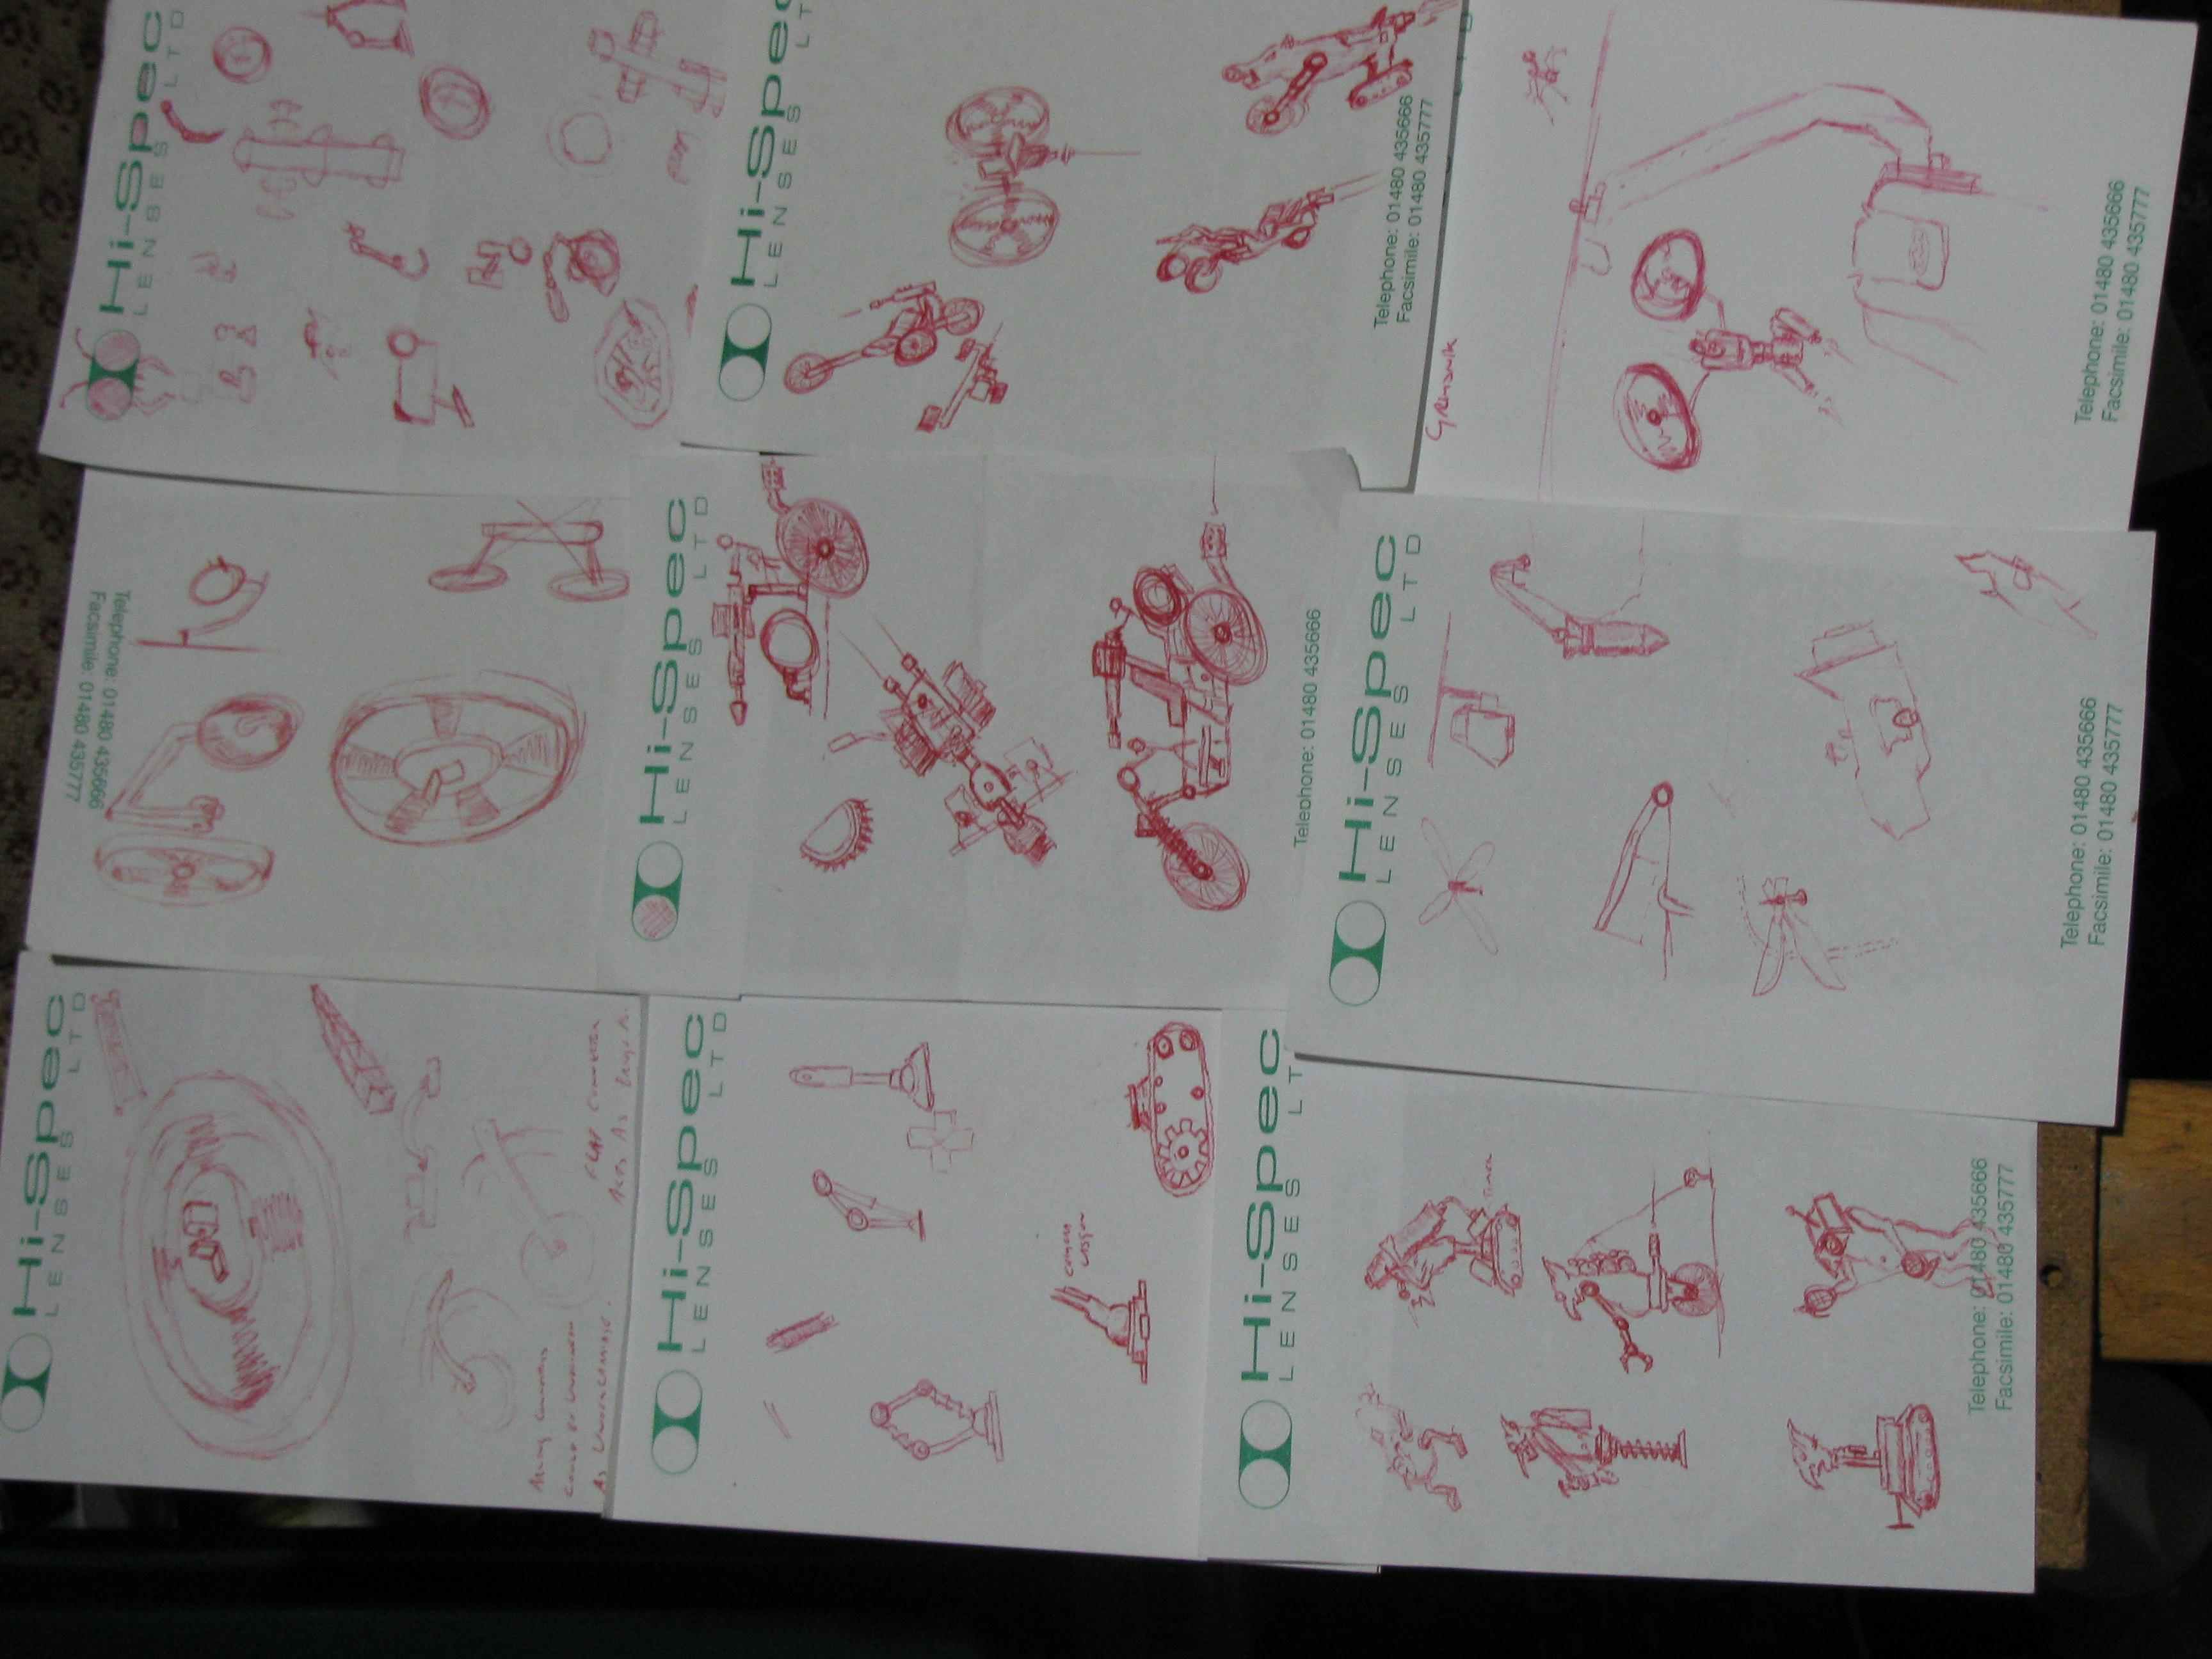 Bionik, Conversion, Cybork, Cyborks, Gorkamekka, Mekanik, Mekboy, Orks, Warhammer 40,000